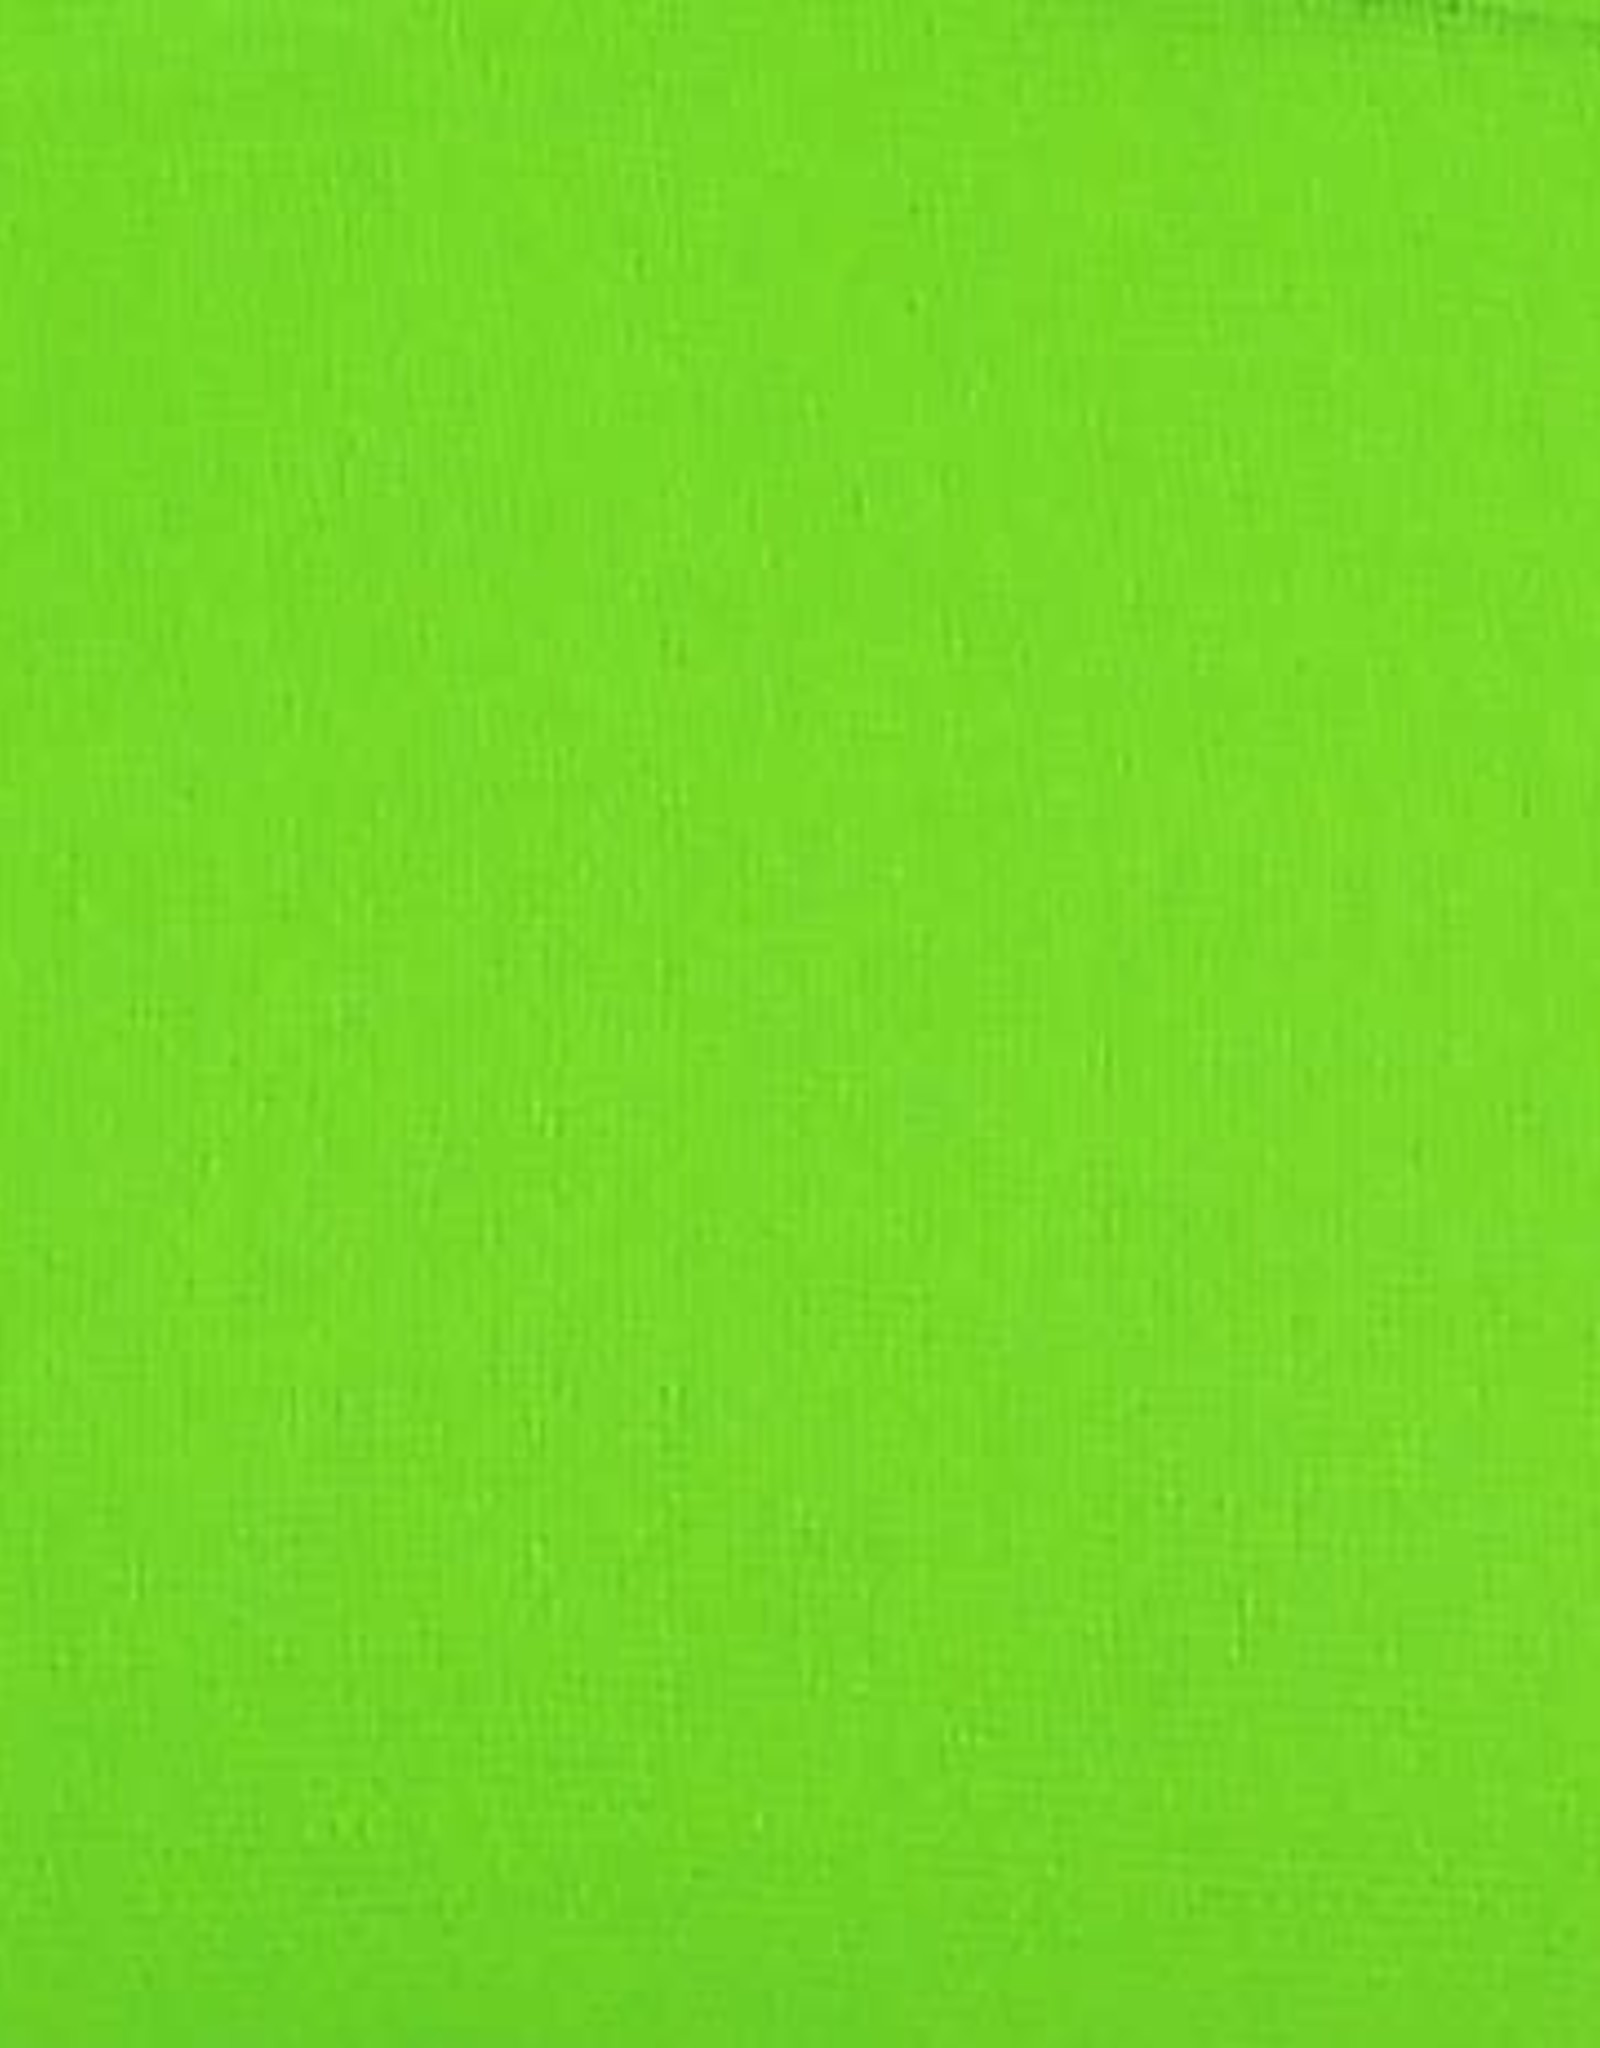 Chiffon 58 - 60 Inches Lime Green (Yard)